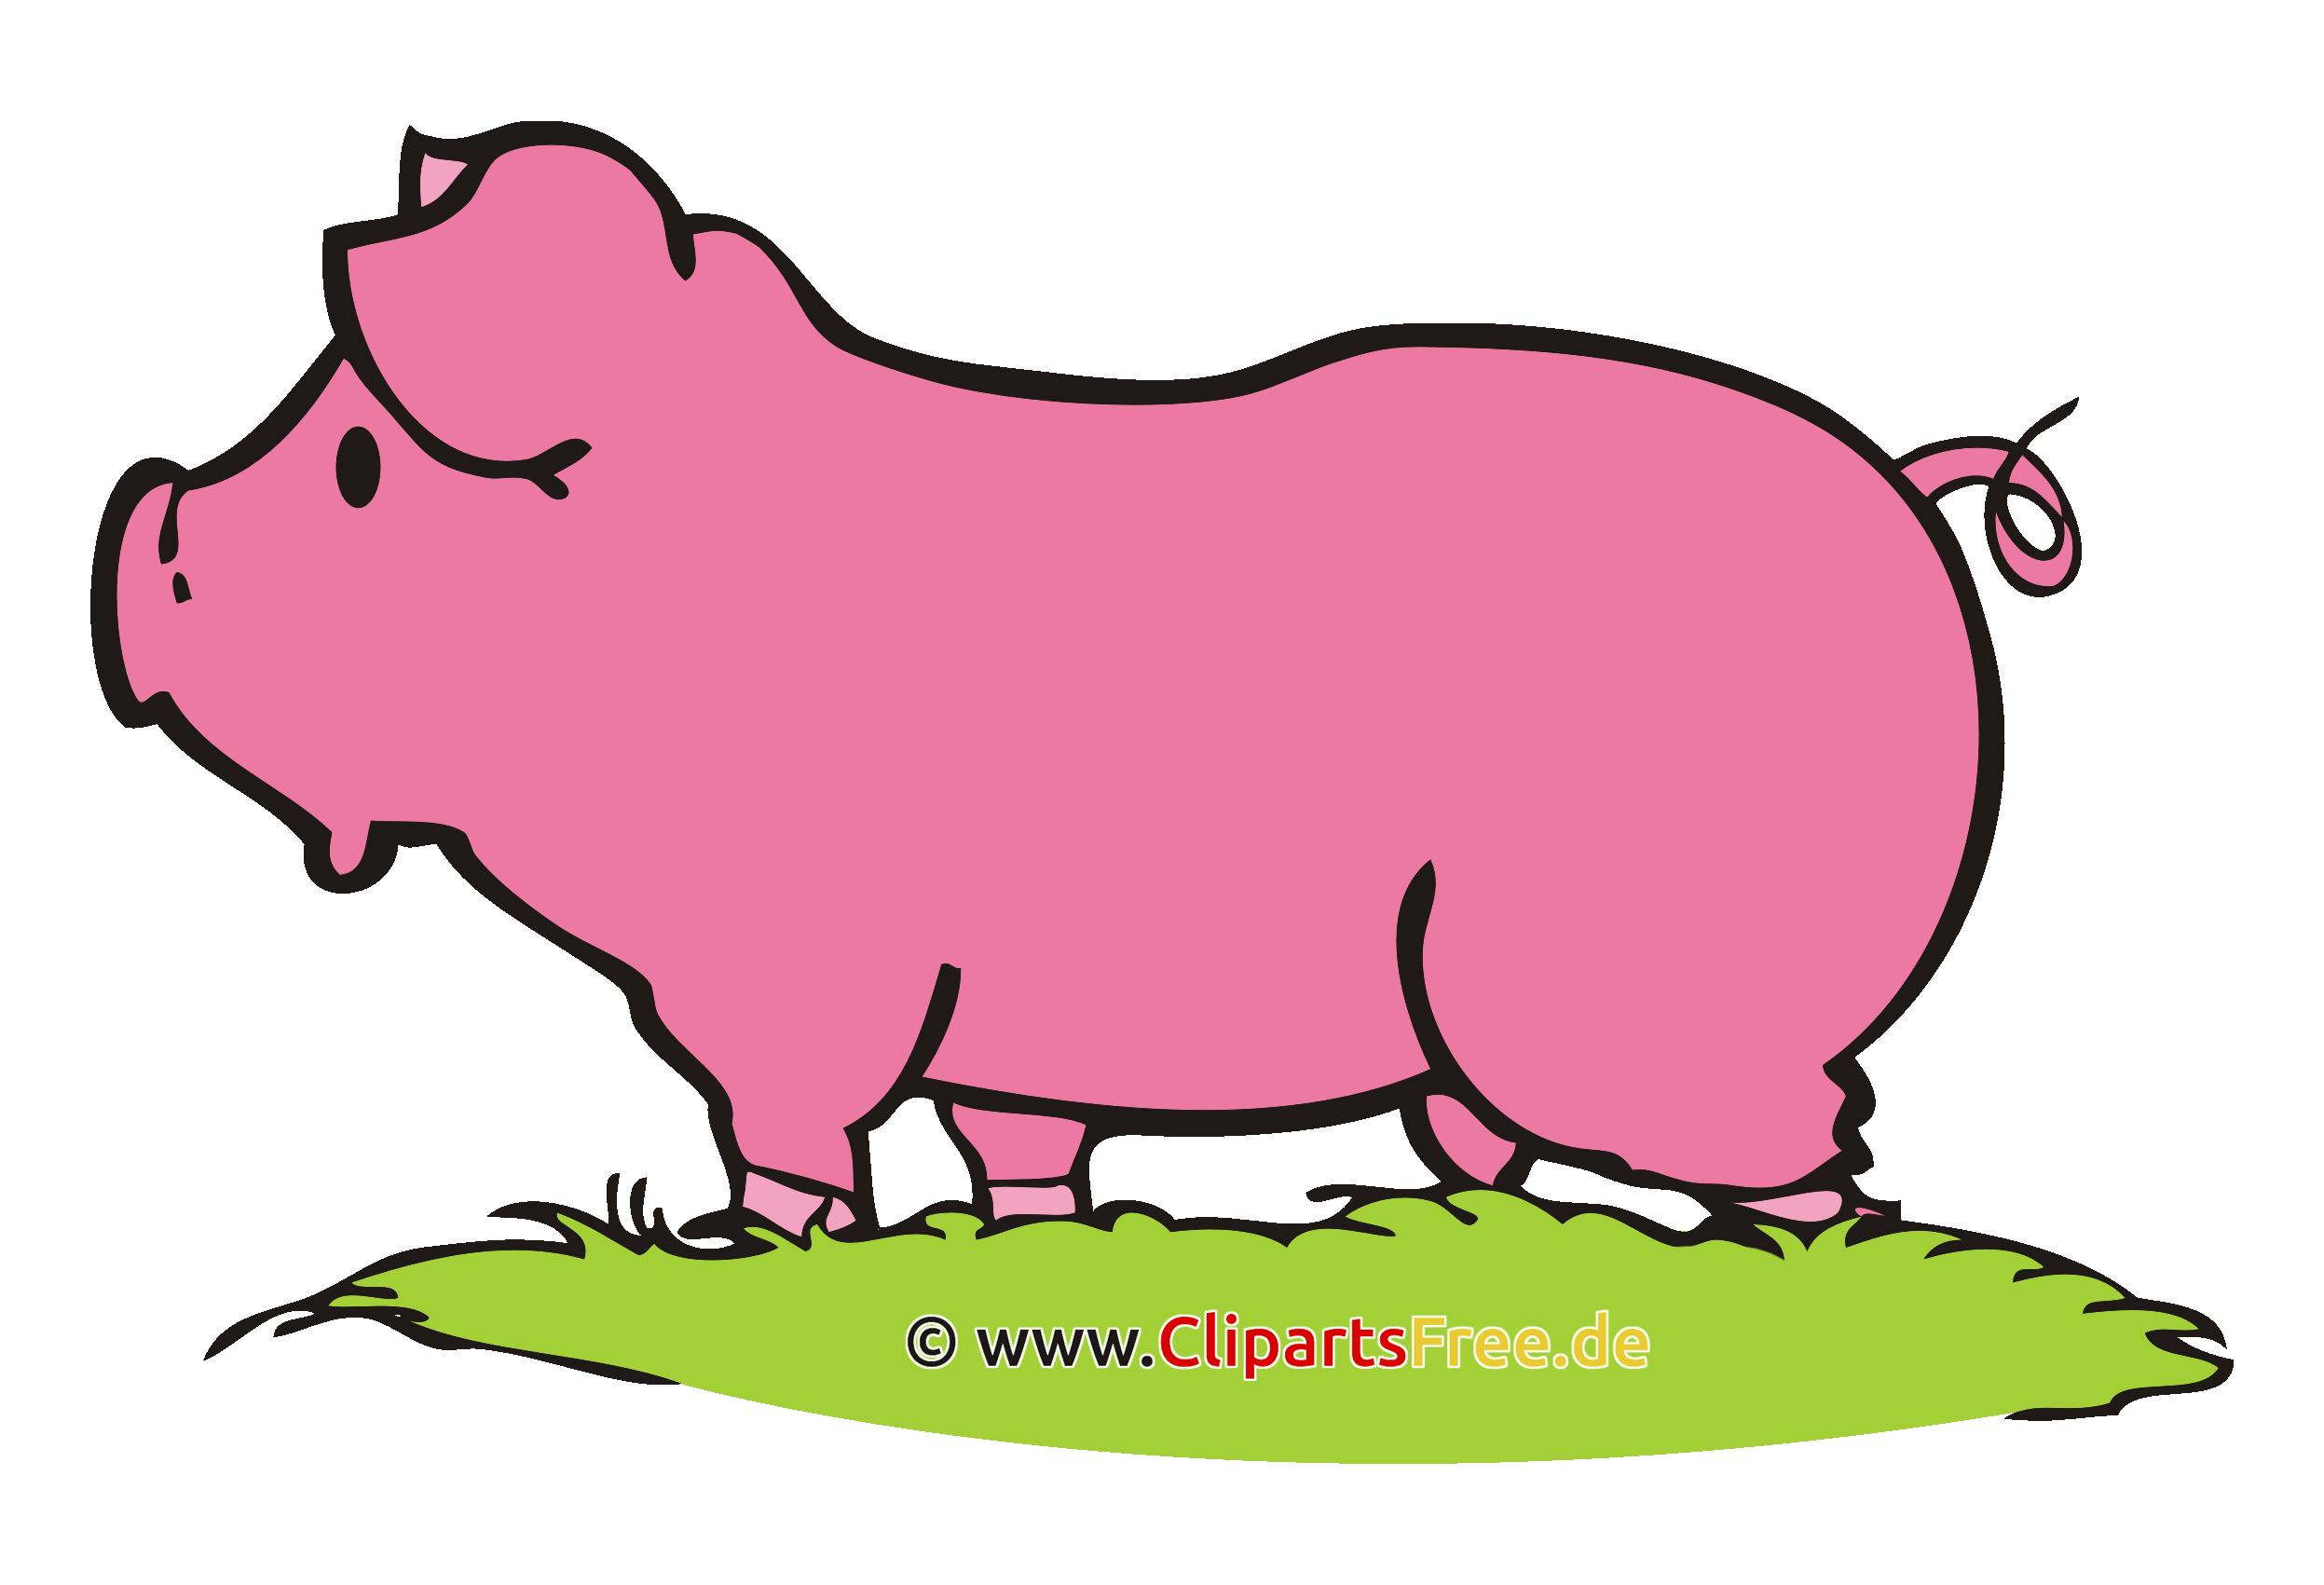 Schwein Clipart, Bild, Cartoon, Grafik, Illustration